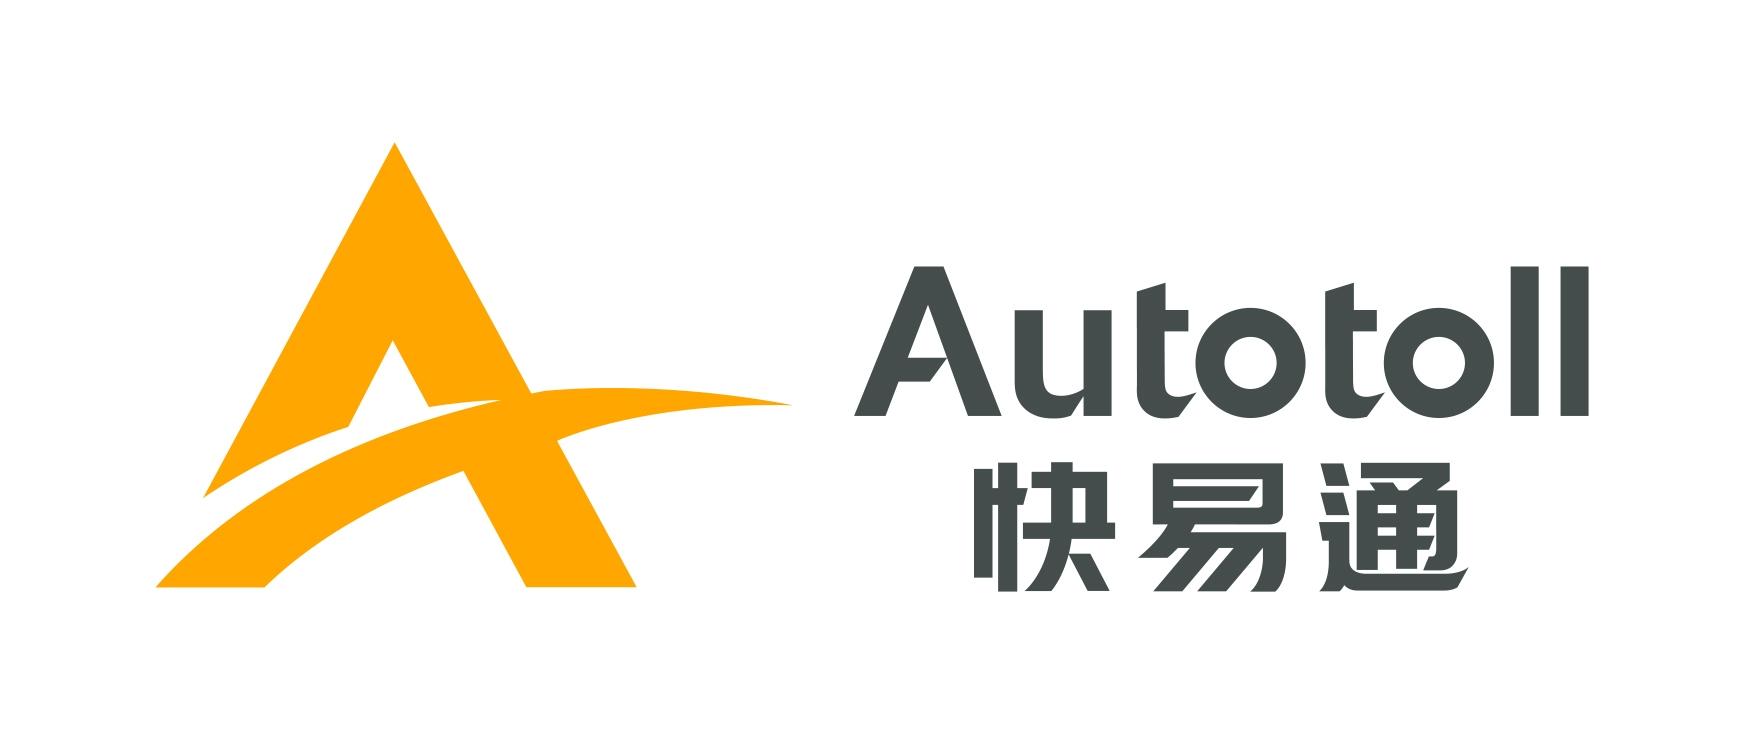 Autotoll_CYMK_Bilingual_Horizontal